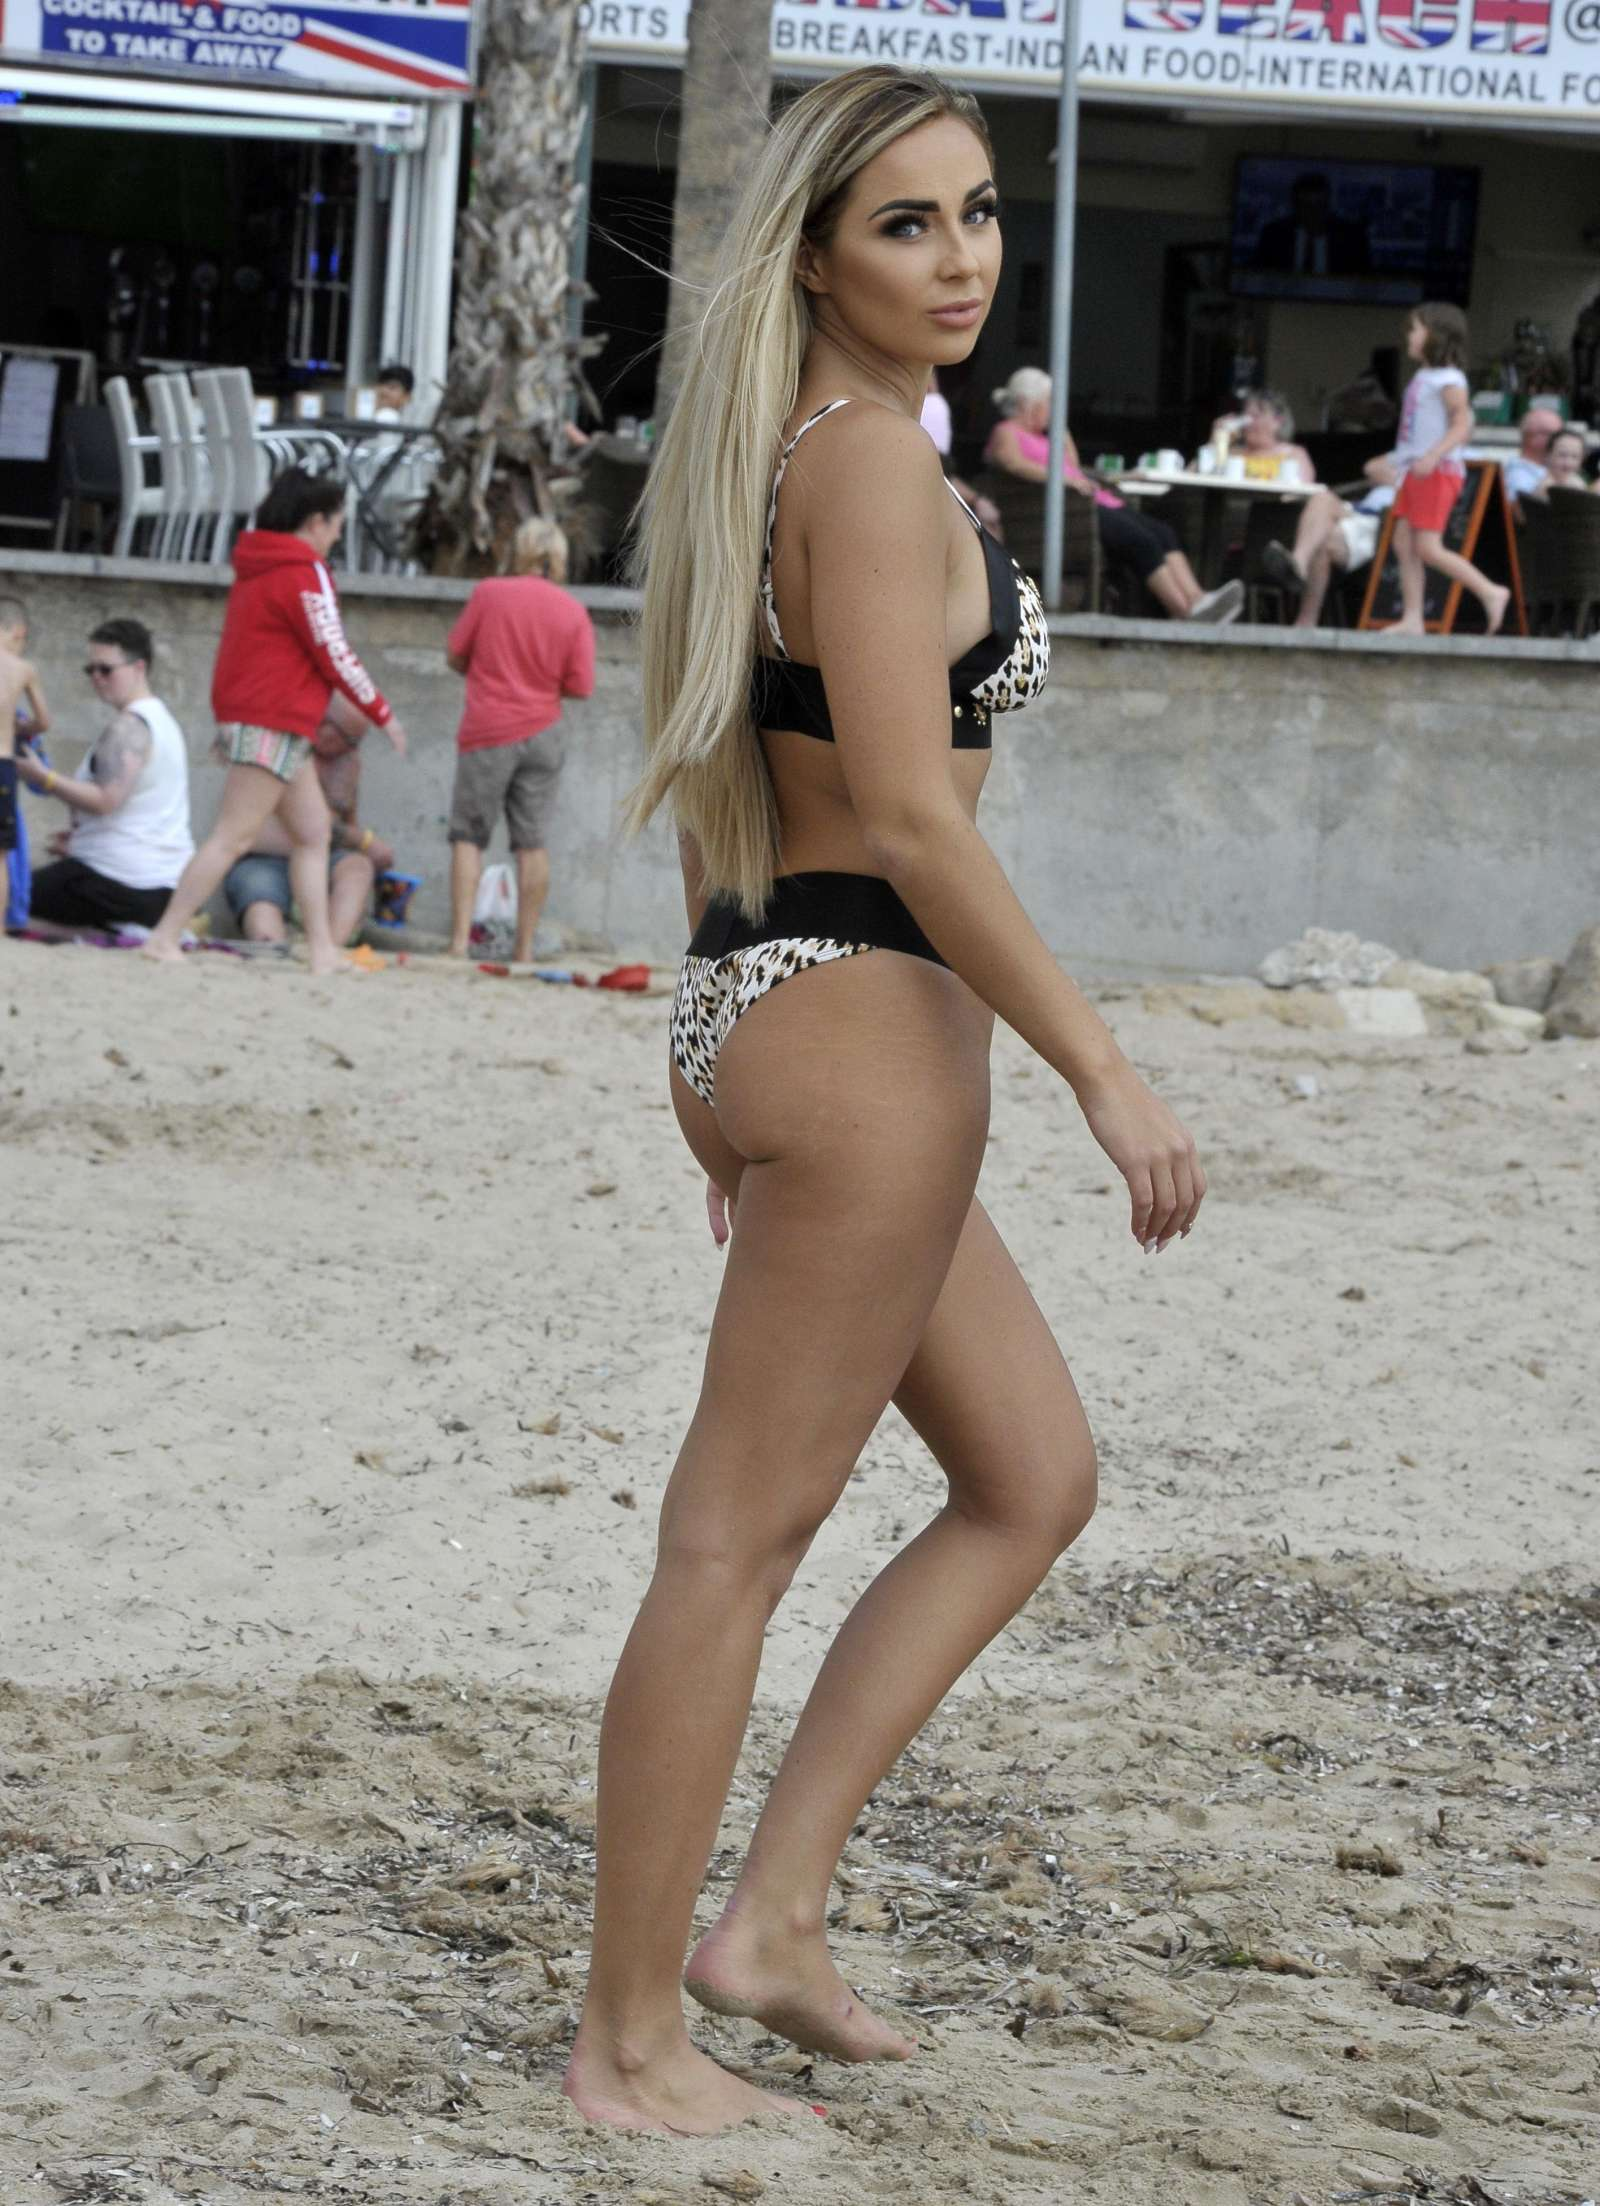 Georgia Cole naked (74 photos), foto Ass, Twitter, in bikini 2019